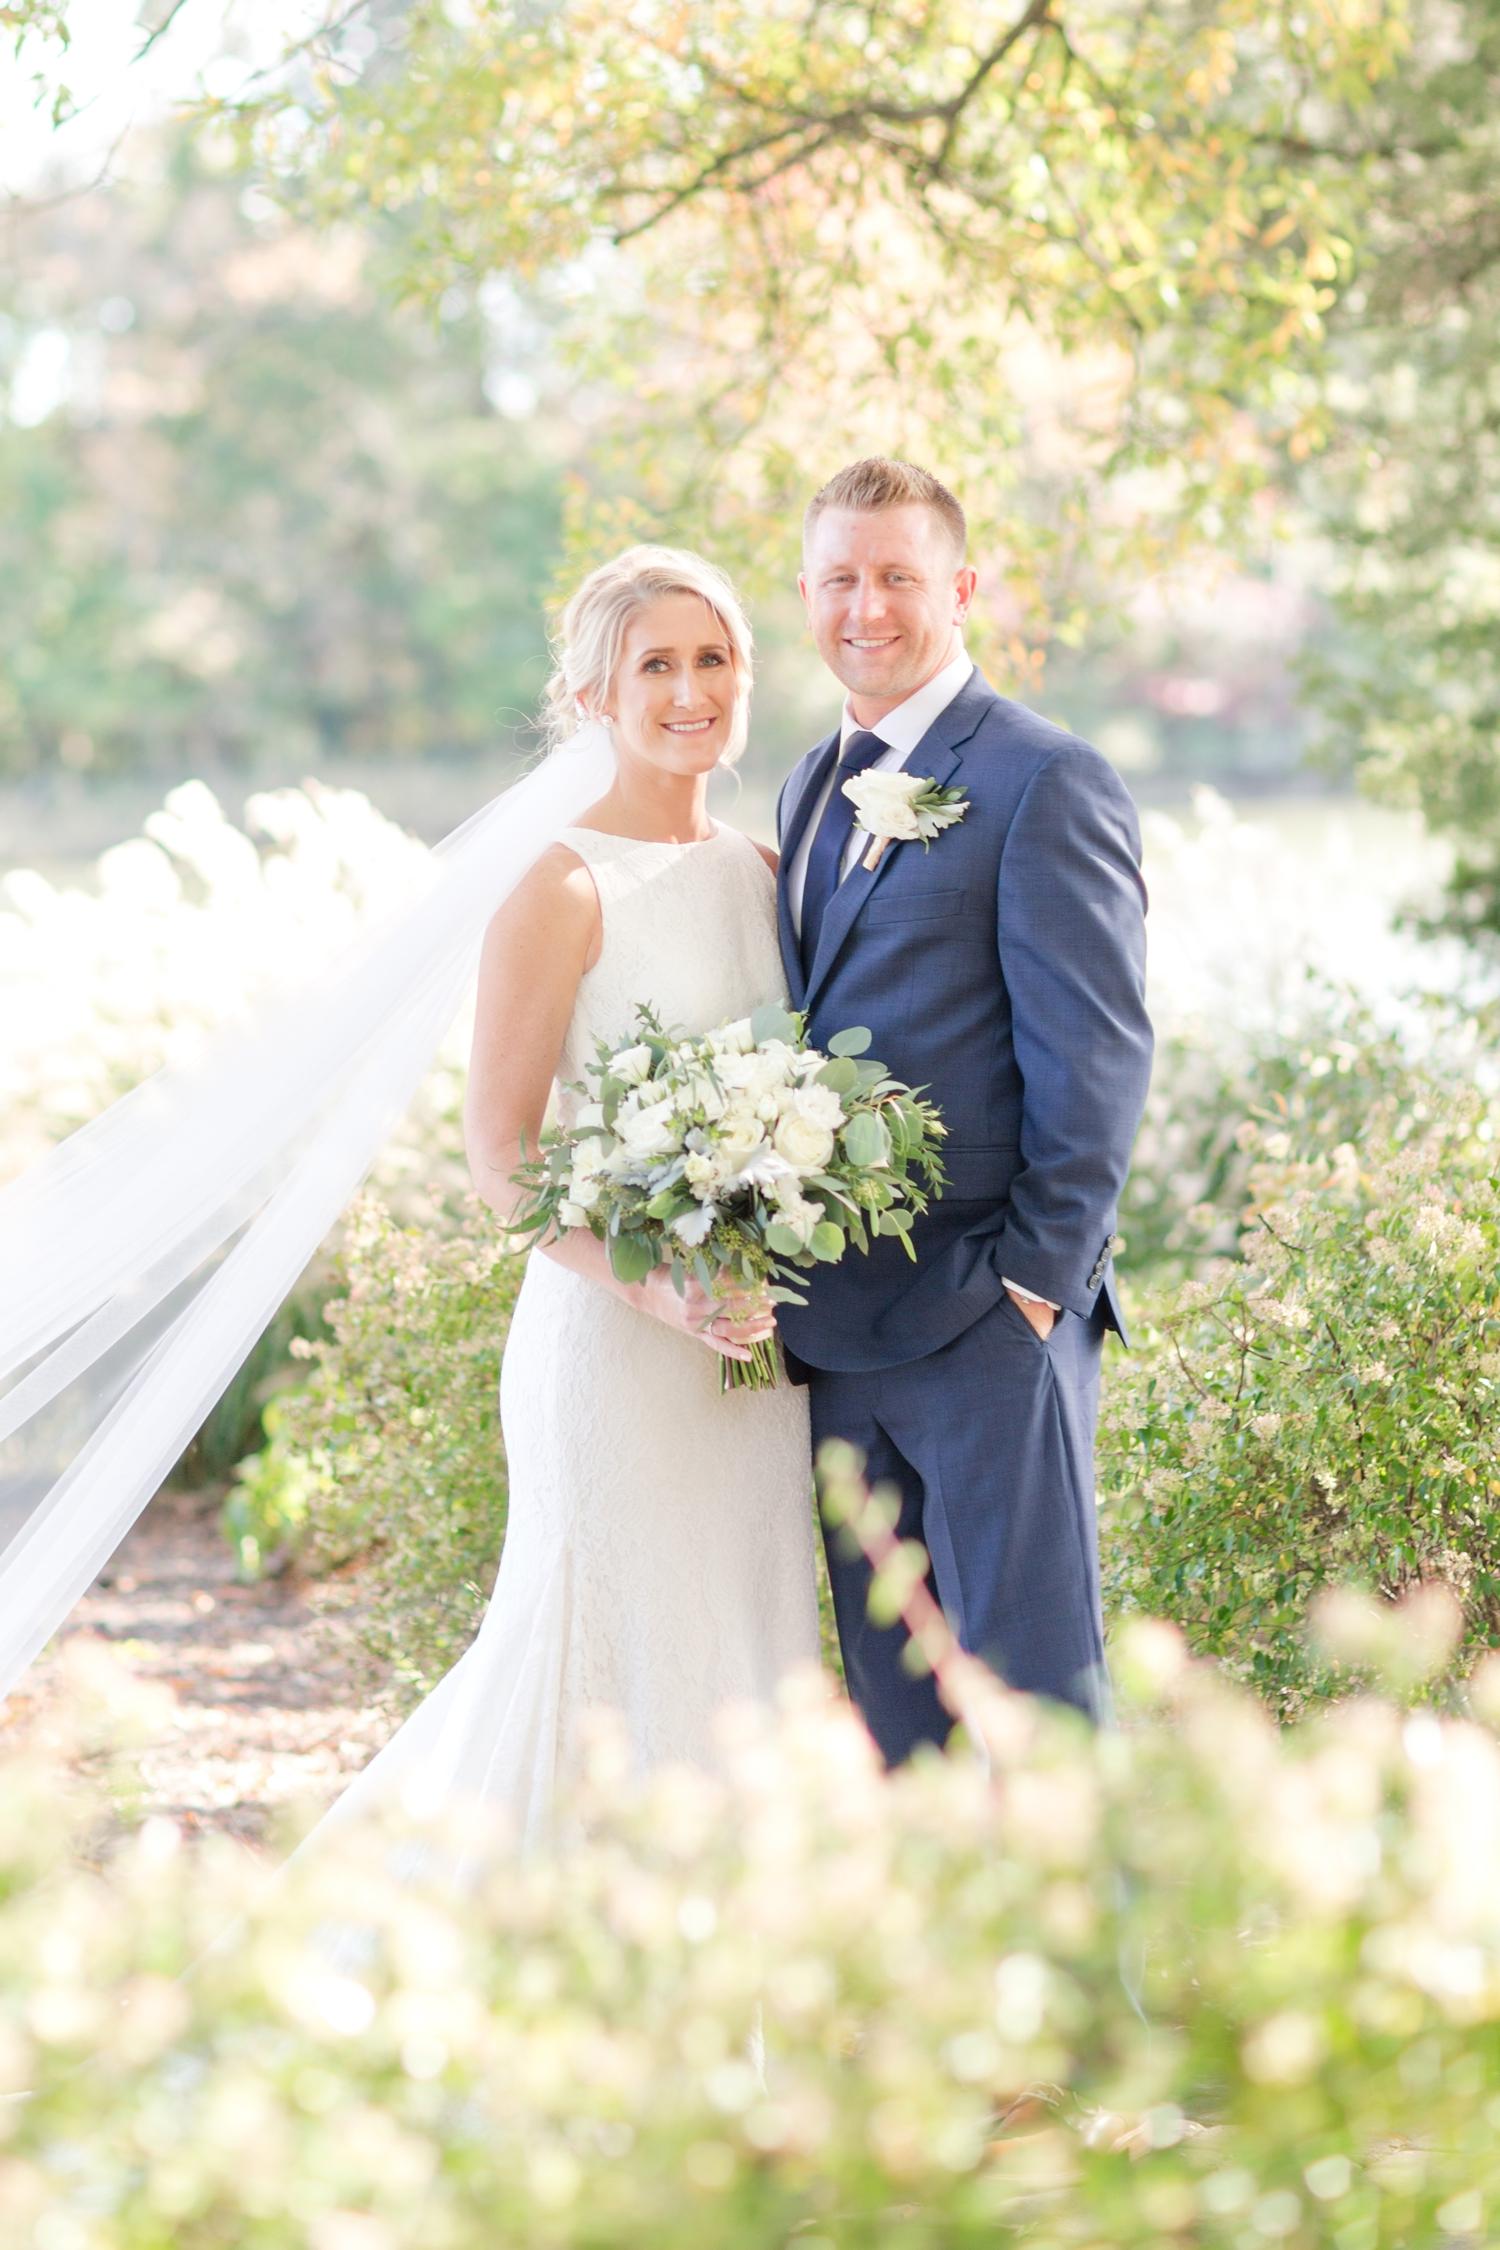 Wojciechowski Wedding-201_the-oaks-waterfront-inn-wedding-easton-maryland-wedding-photography-anna-grace-photography-photo.jpg